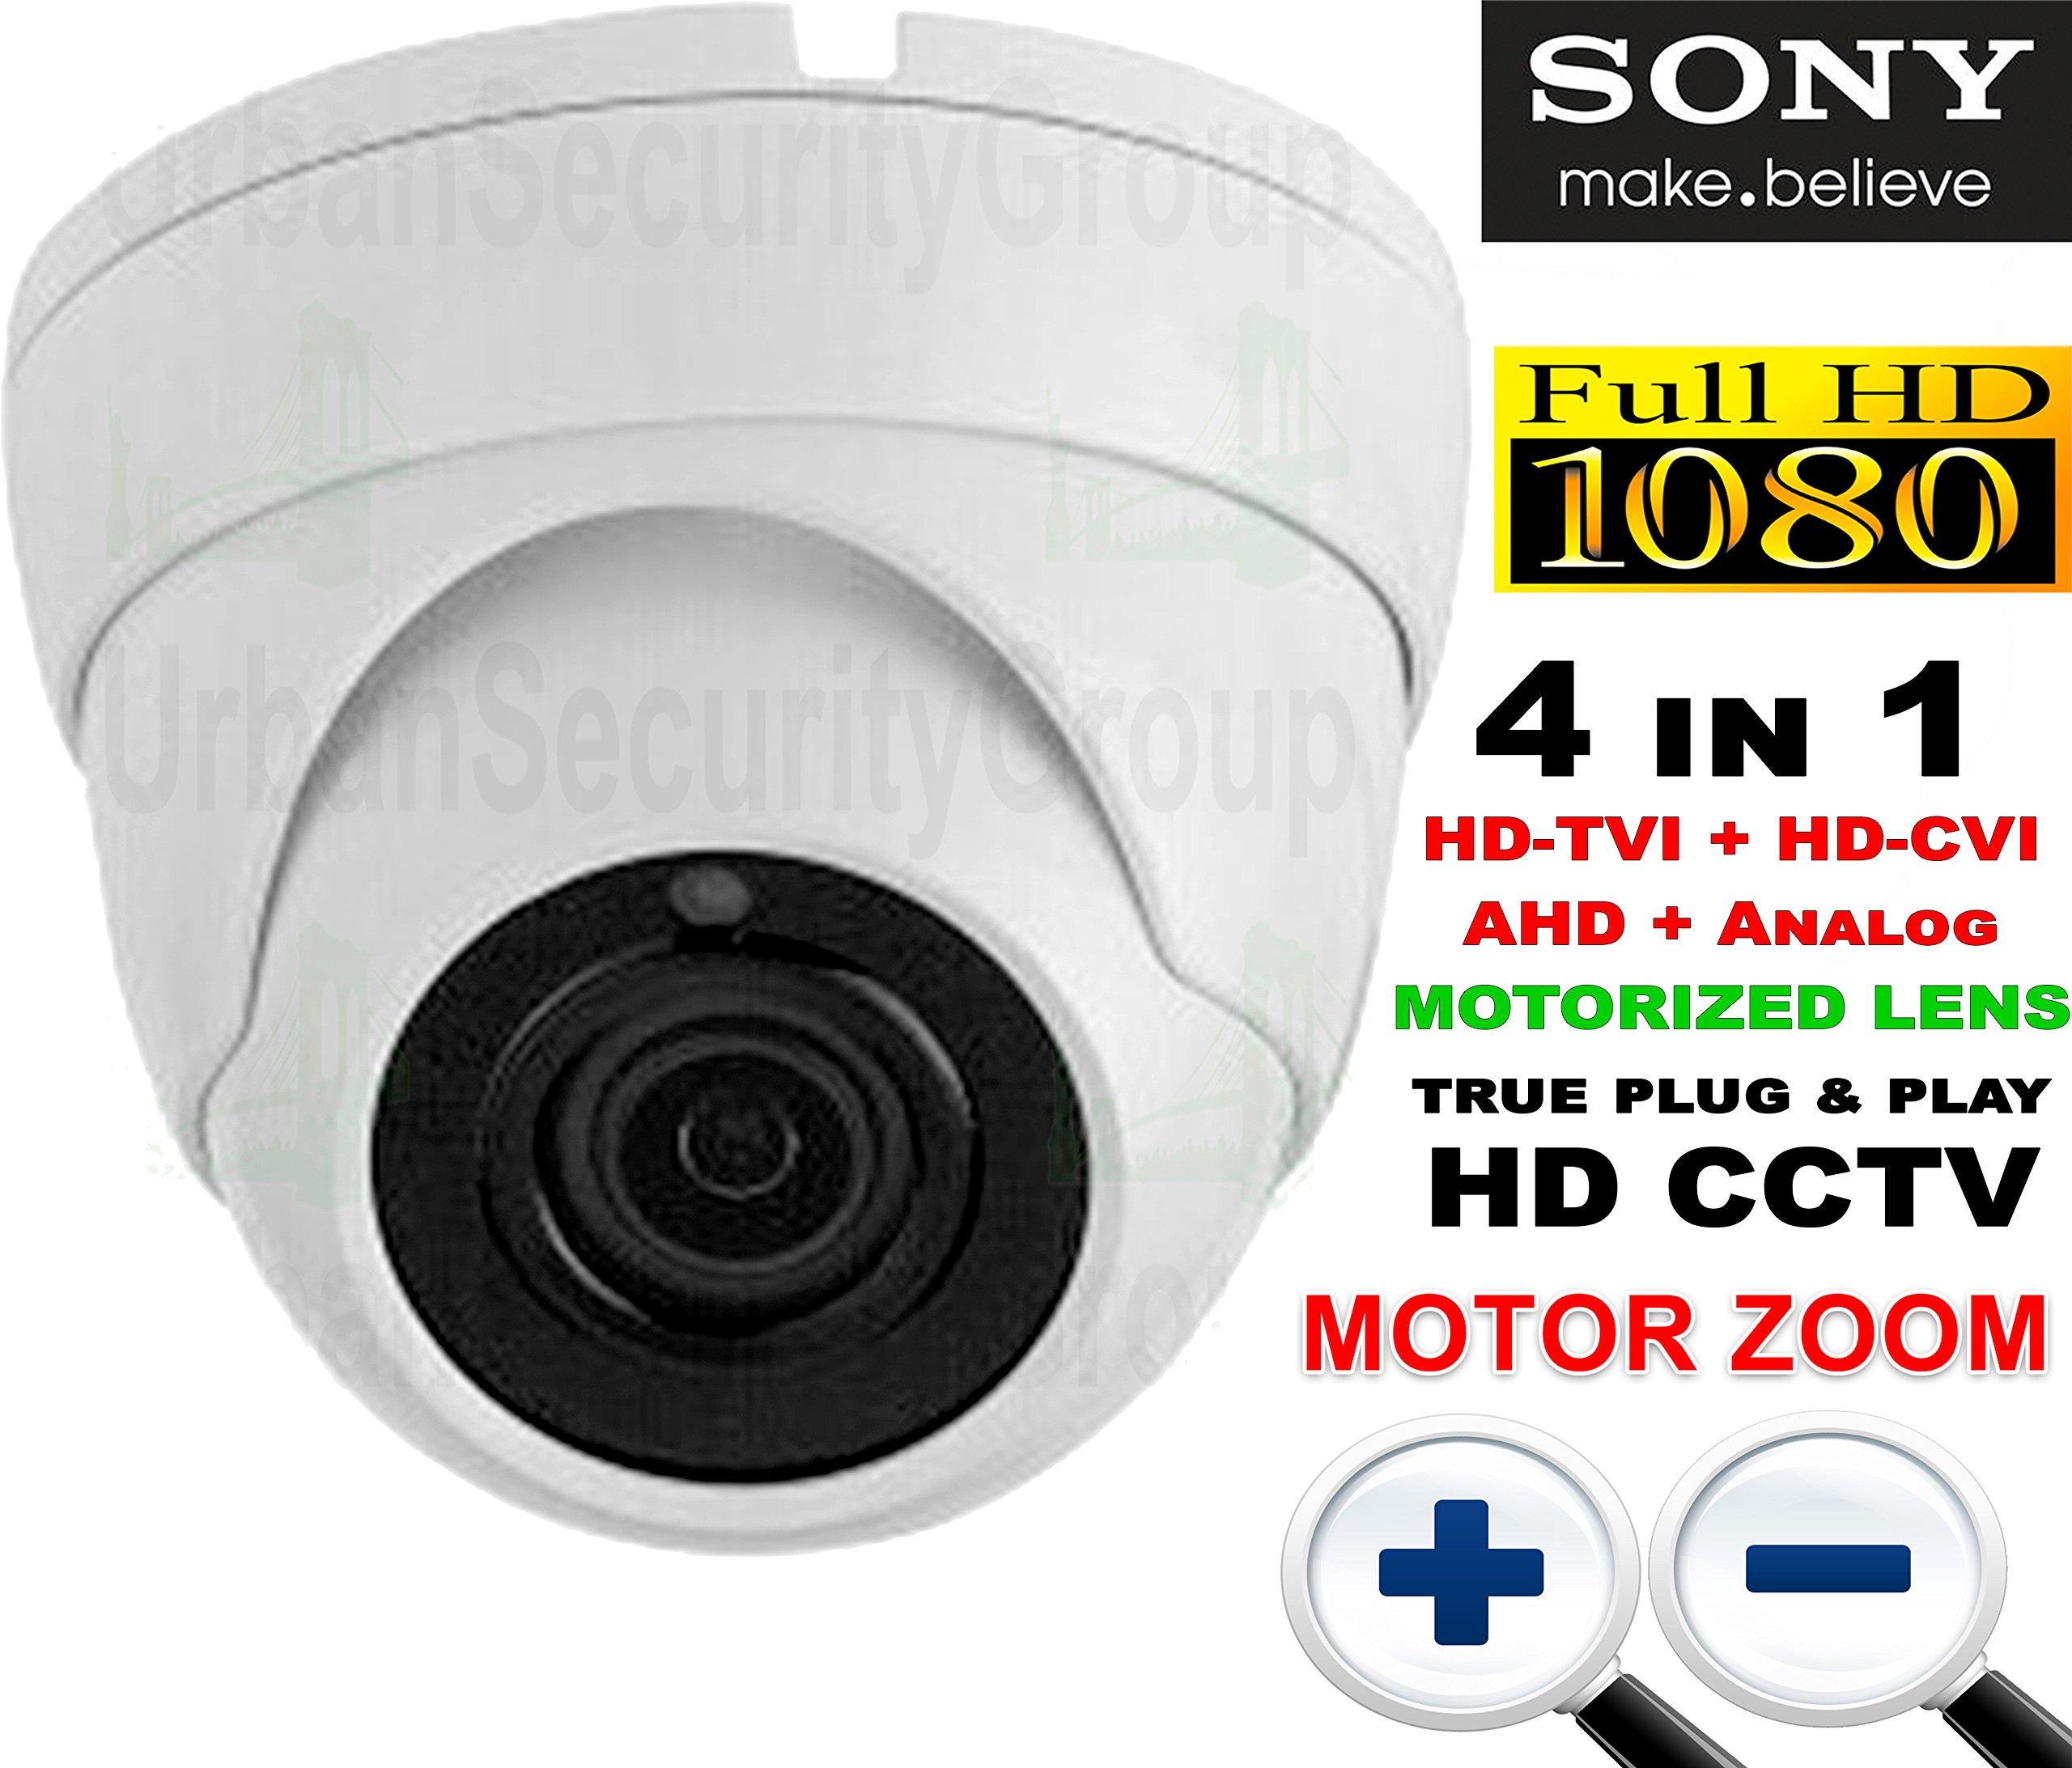 USG Premium Sony Starvis Chipset 2MP 1080P Dome Security Camera with Junction Box : HD-TVI, HD-CVI + Analog BNC Formats : MOTORIZED via UTC 2.8-12mm HD Lens : 18x Square IR LEDs : Business Grade